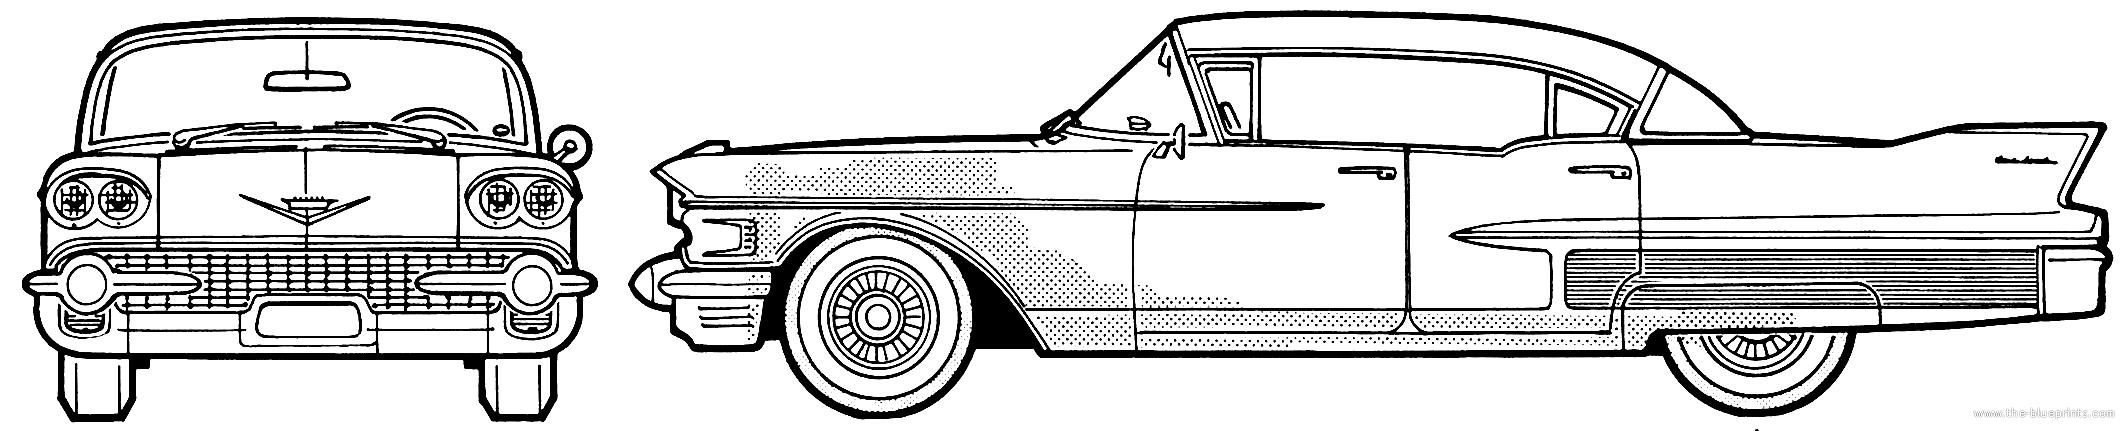 Blueprints > Cars > Cadillac > Cadillac Fleetwood Sixty Special ...